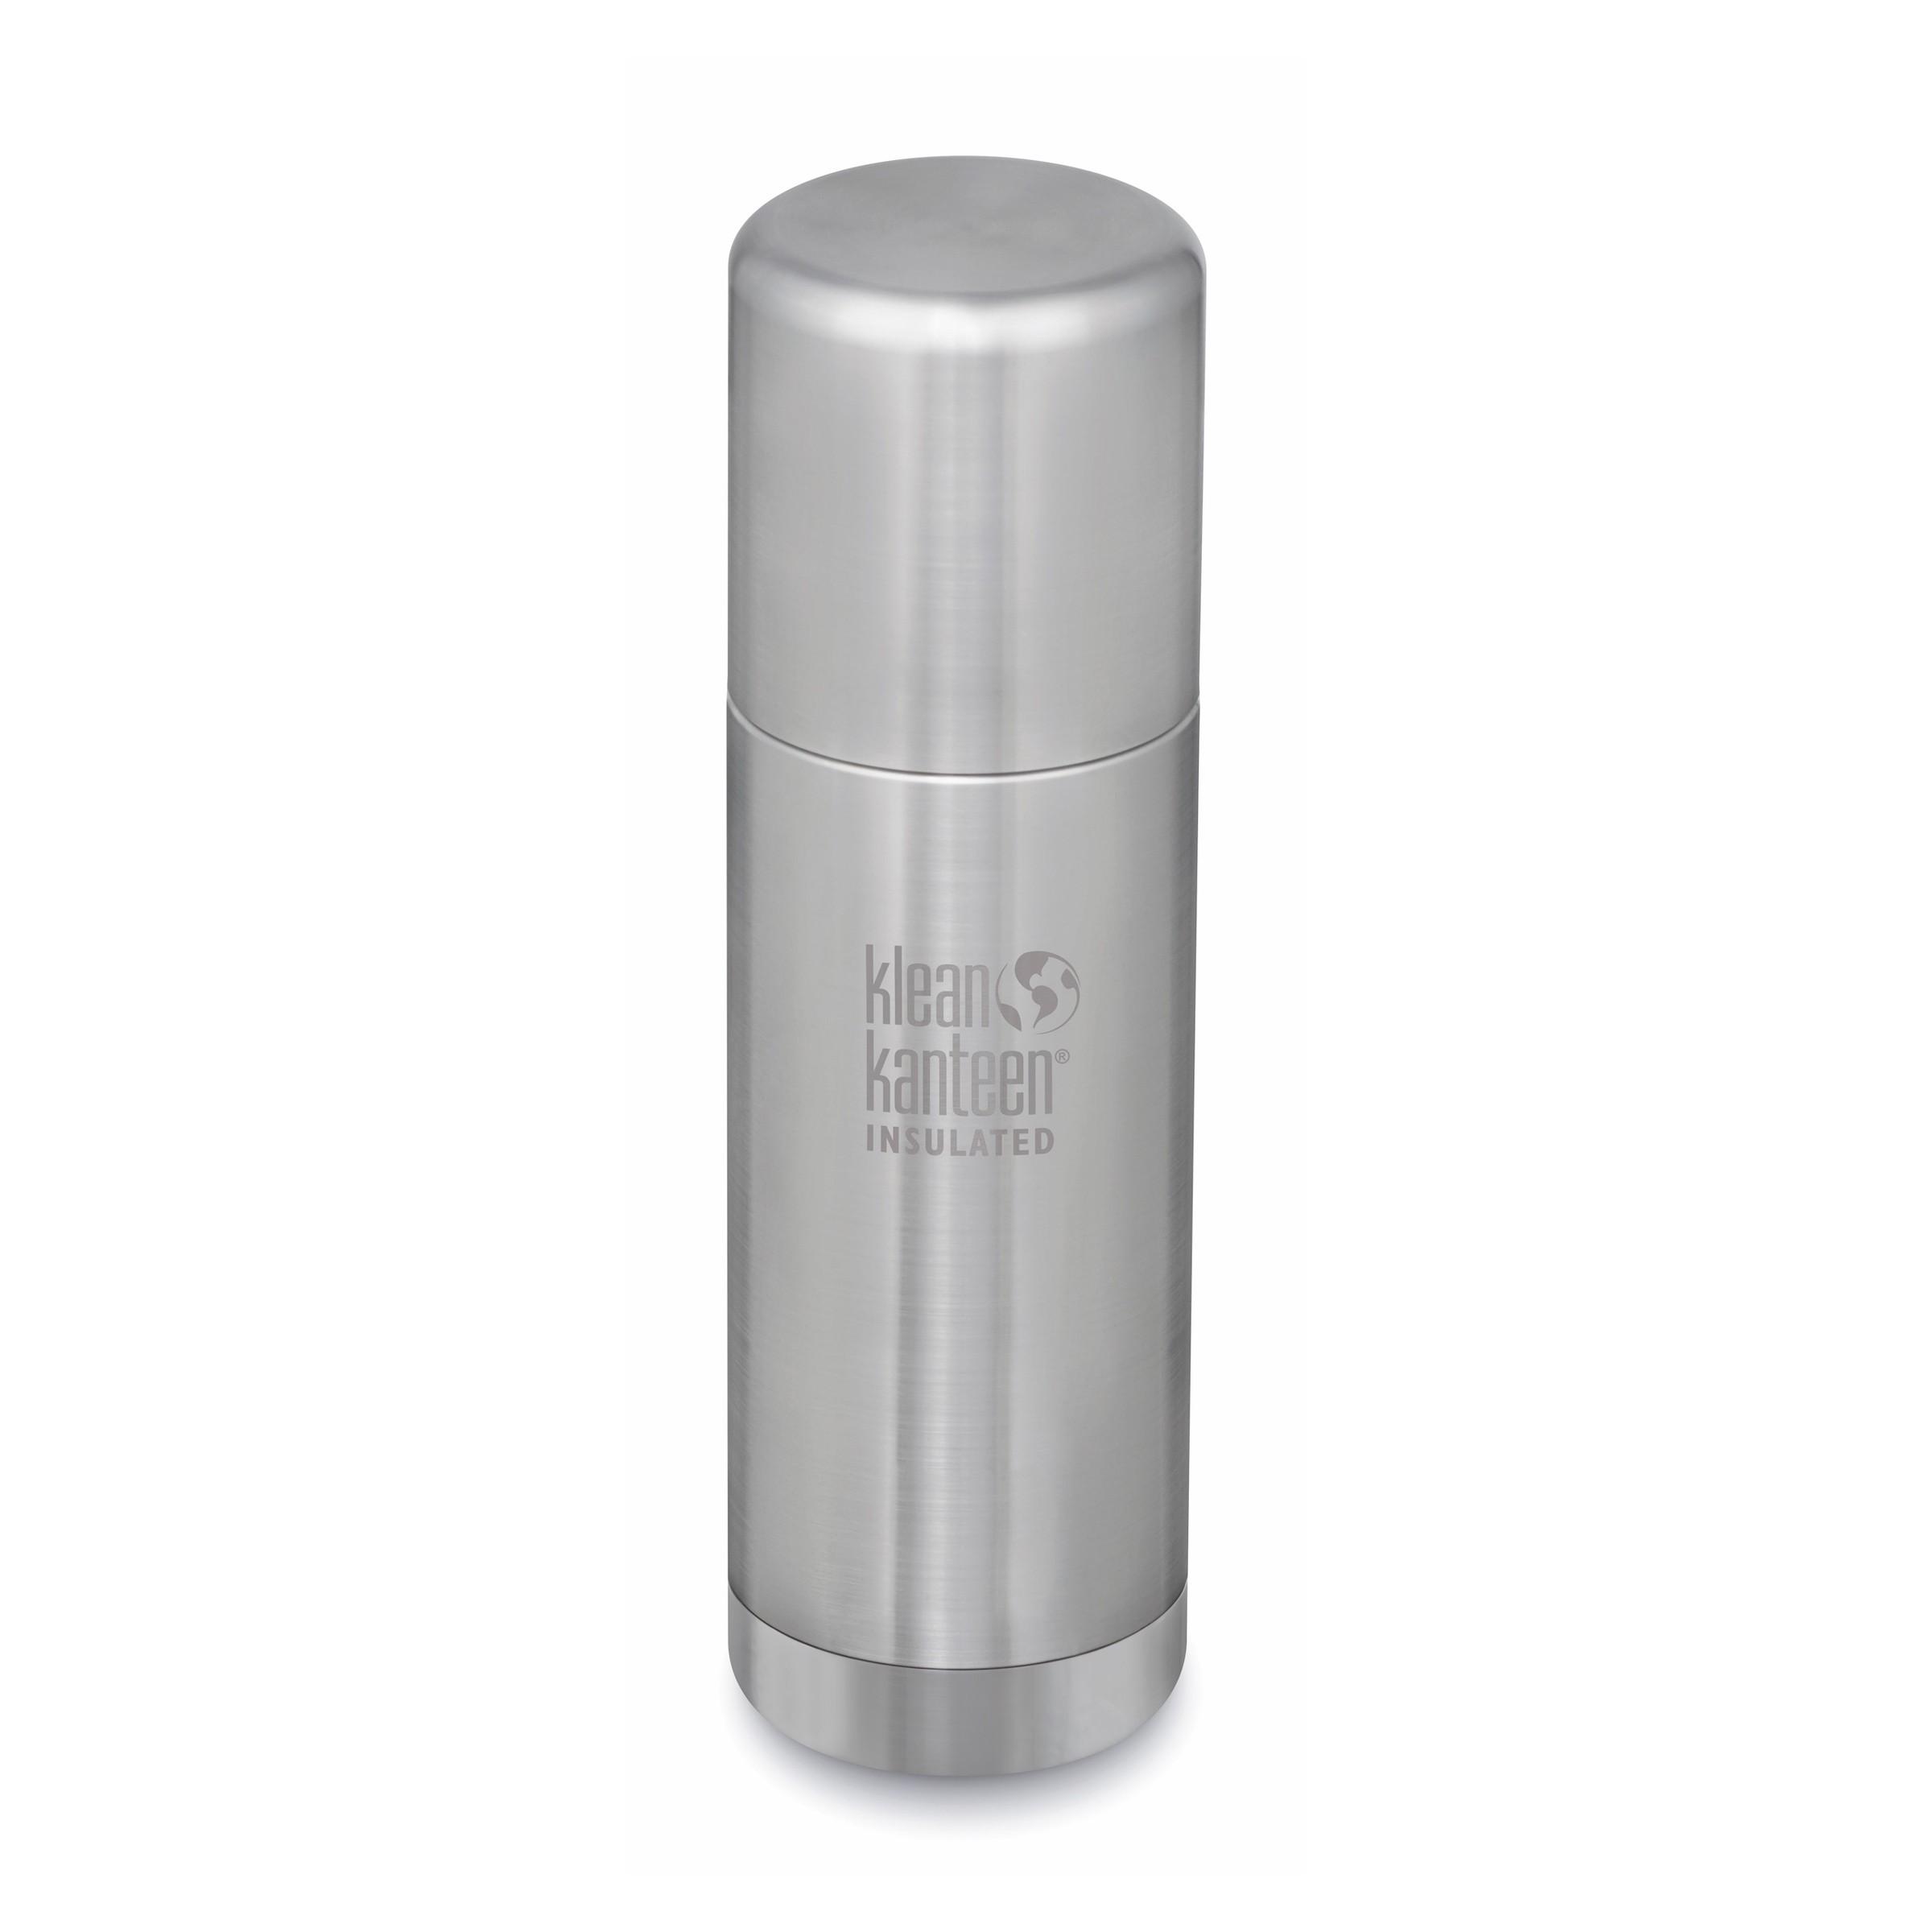 Klean Kanteen Insulated TK Pro High Performance Thermos Flask MATT SHALE BLACK